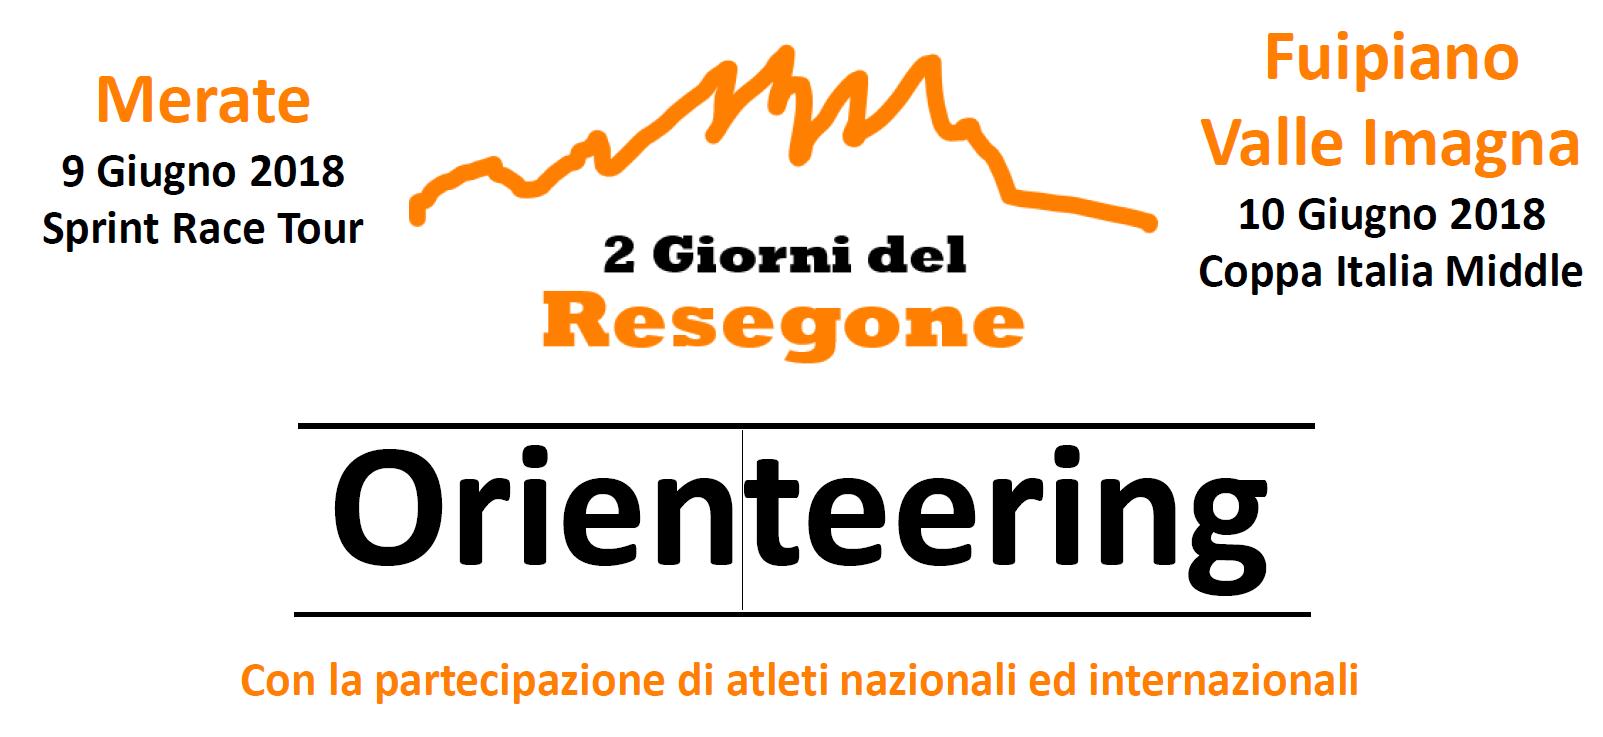 Logo 2 Giorni del Resegone -  Orienteering